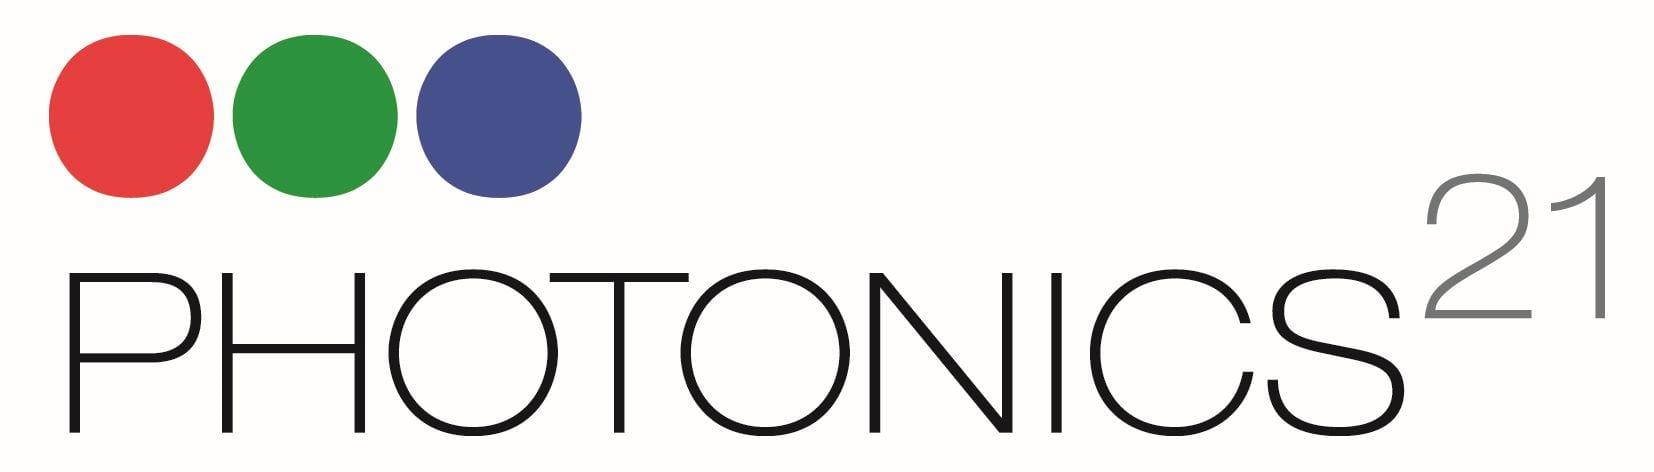 Photonics21 logo